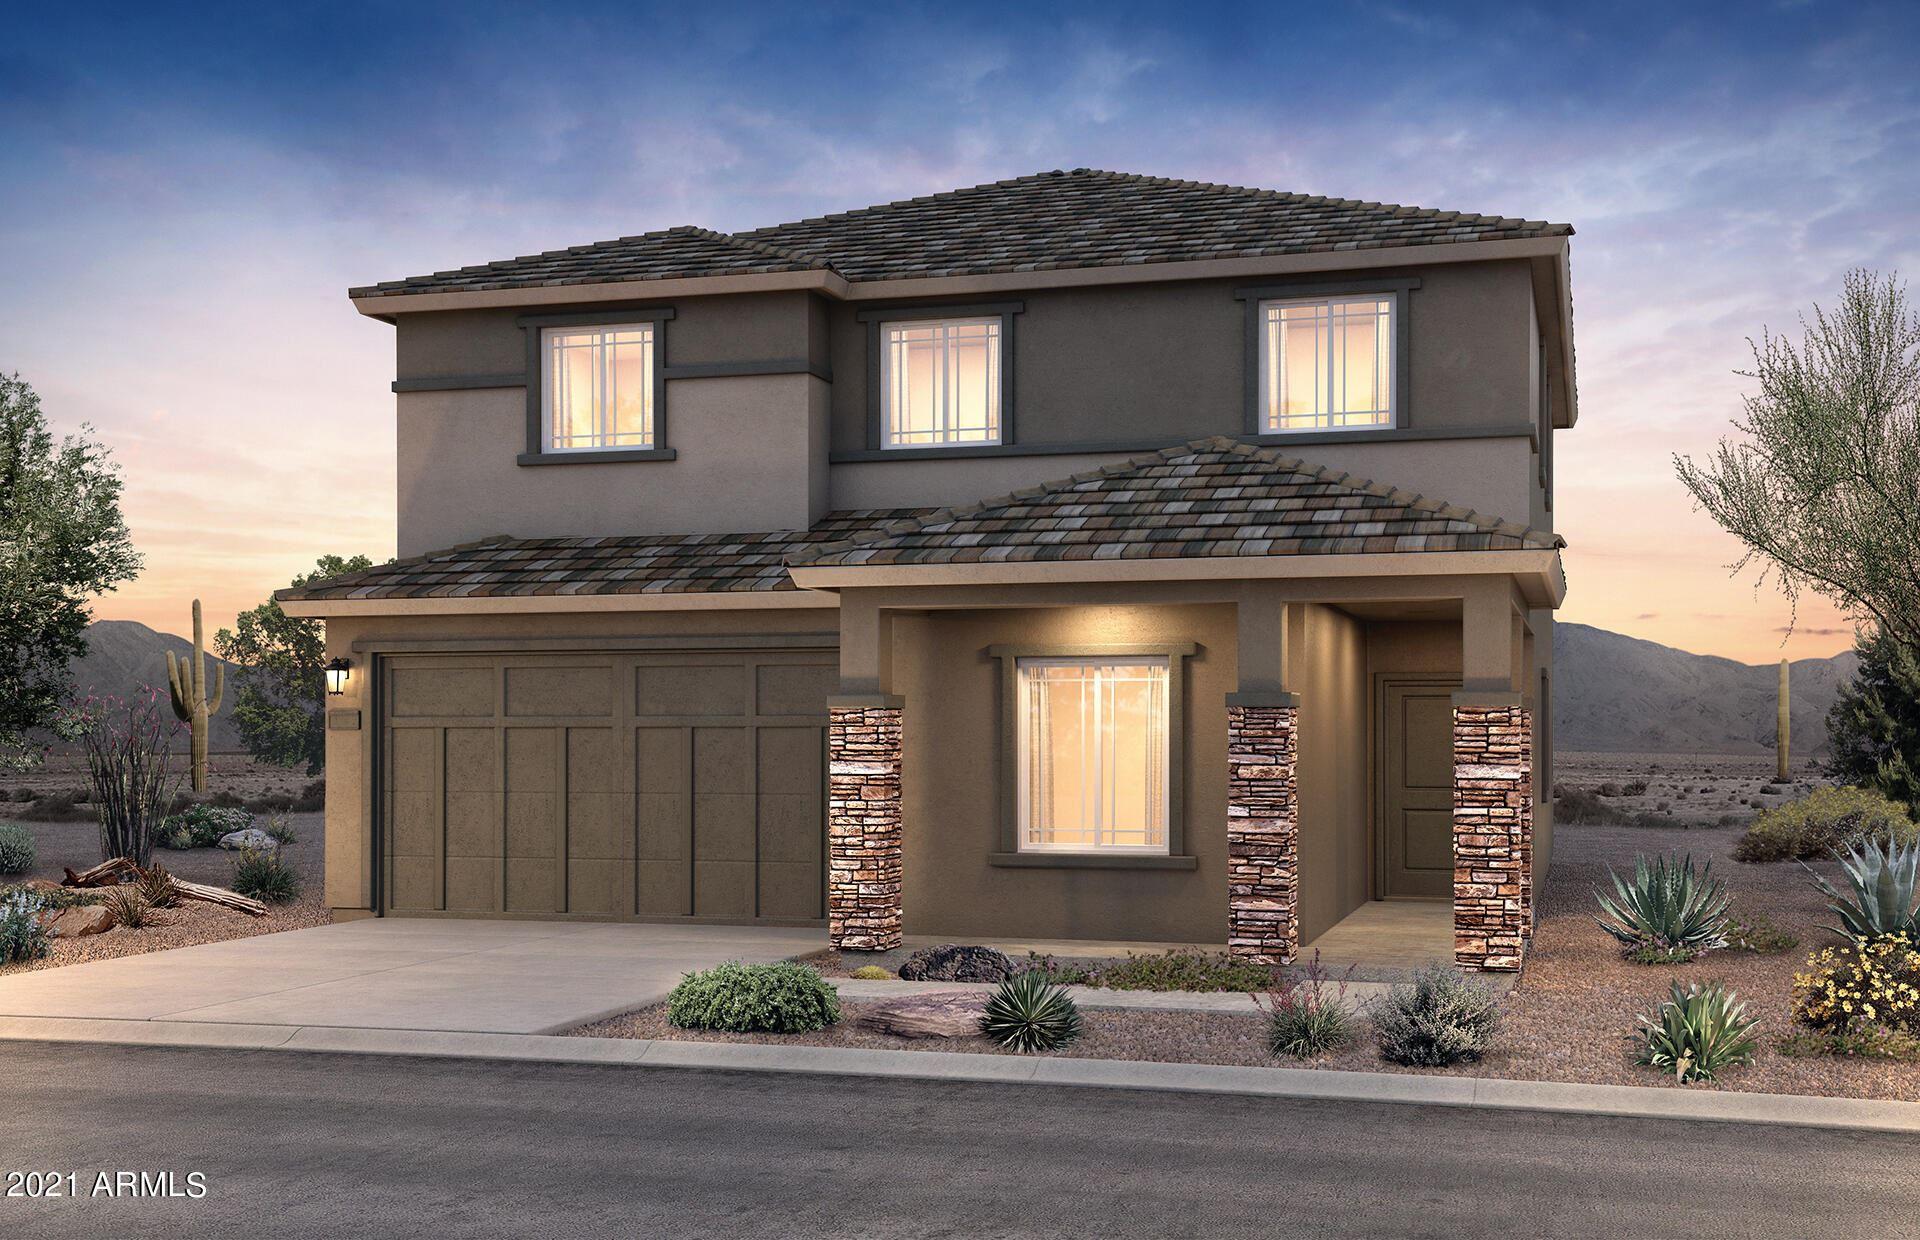 Photo for 18539 N LAKESIDE Drive, Maricopa, AZ 85138 (MLS # 6291115)